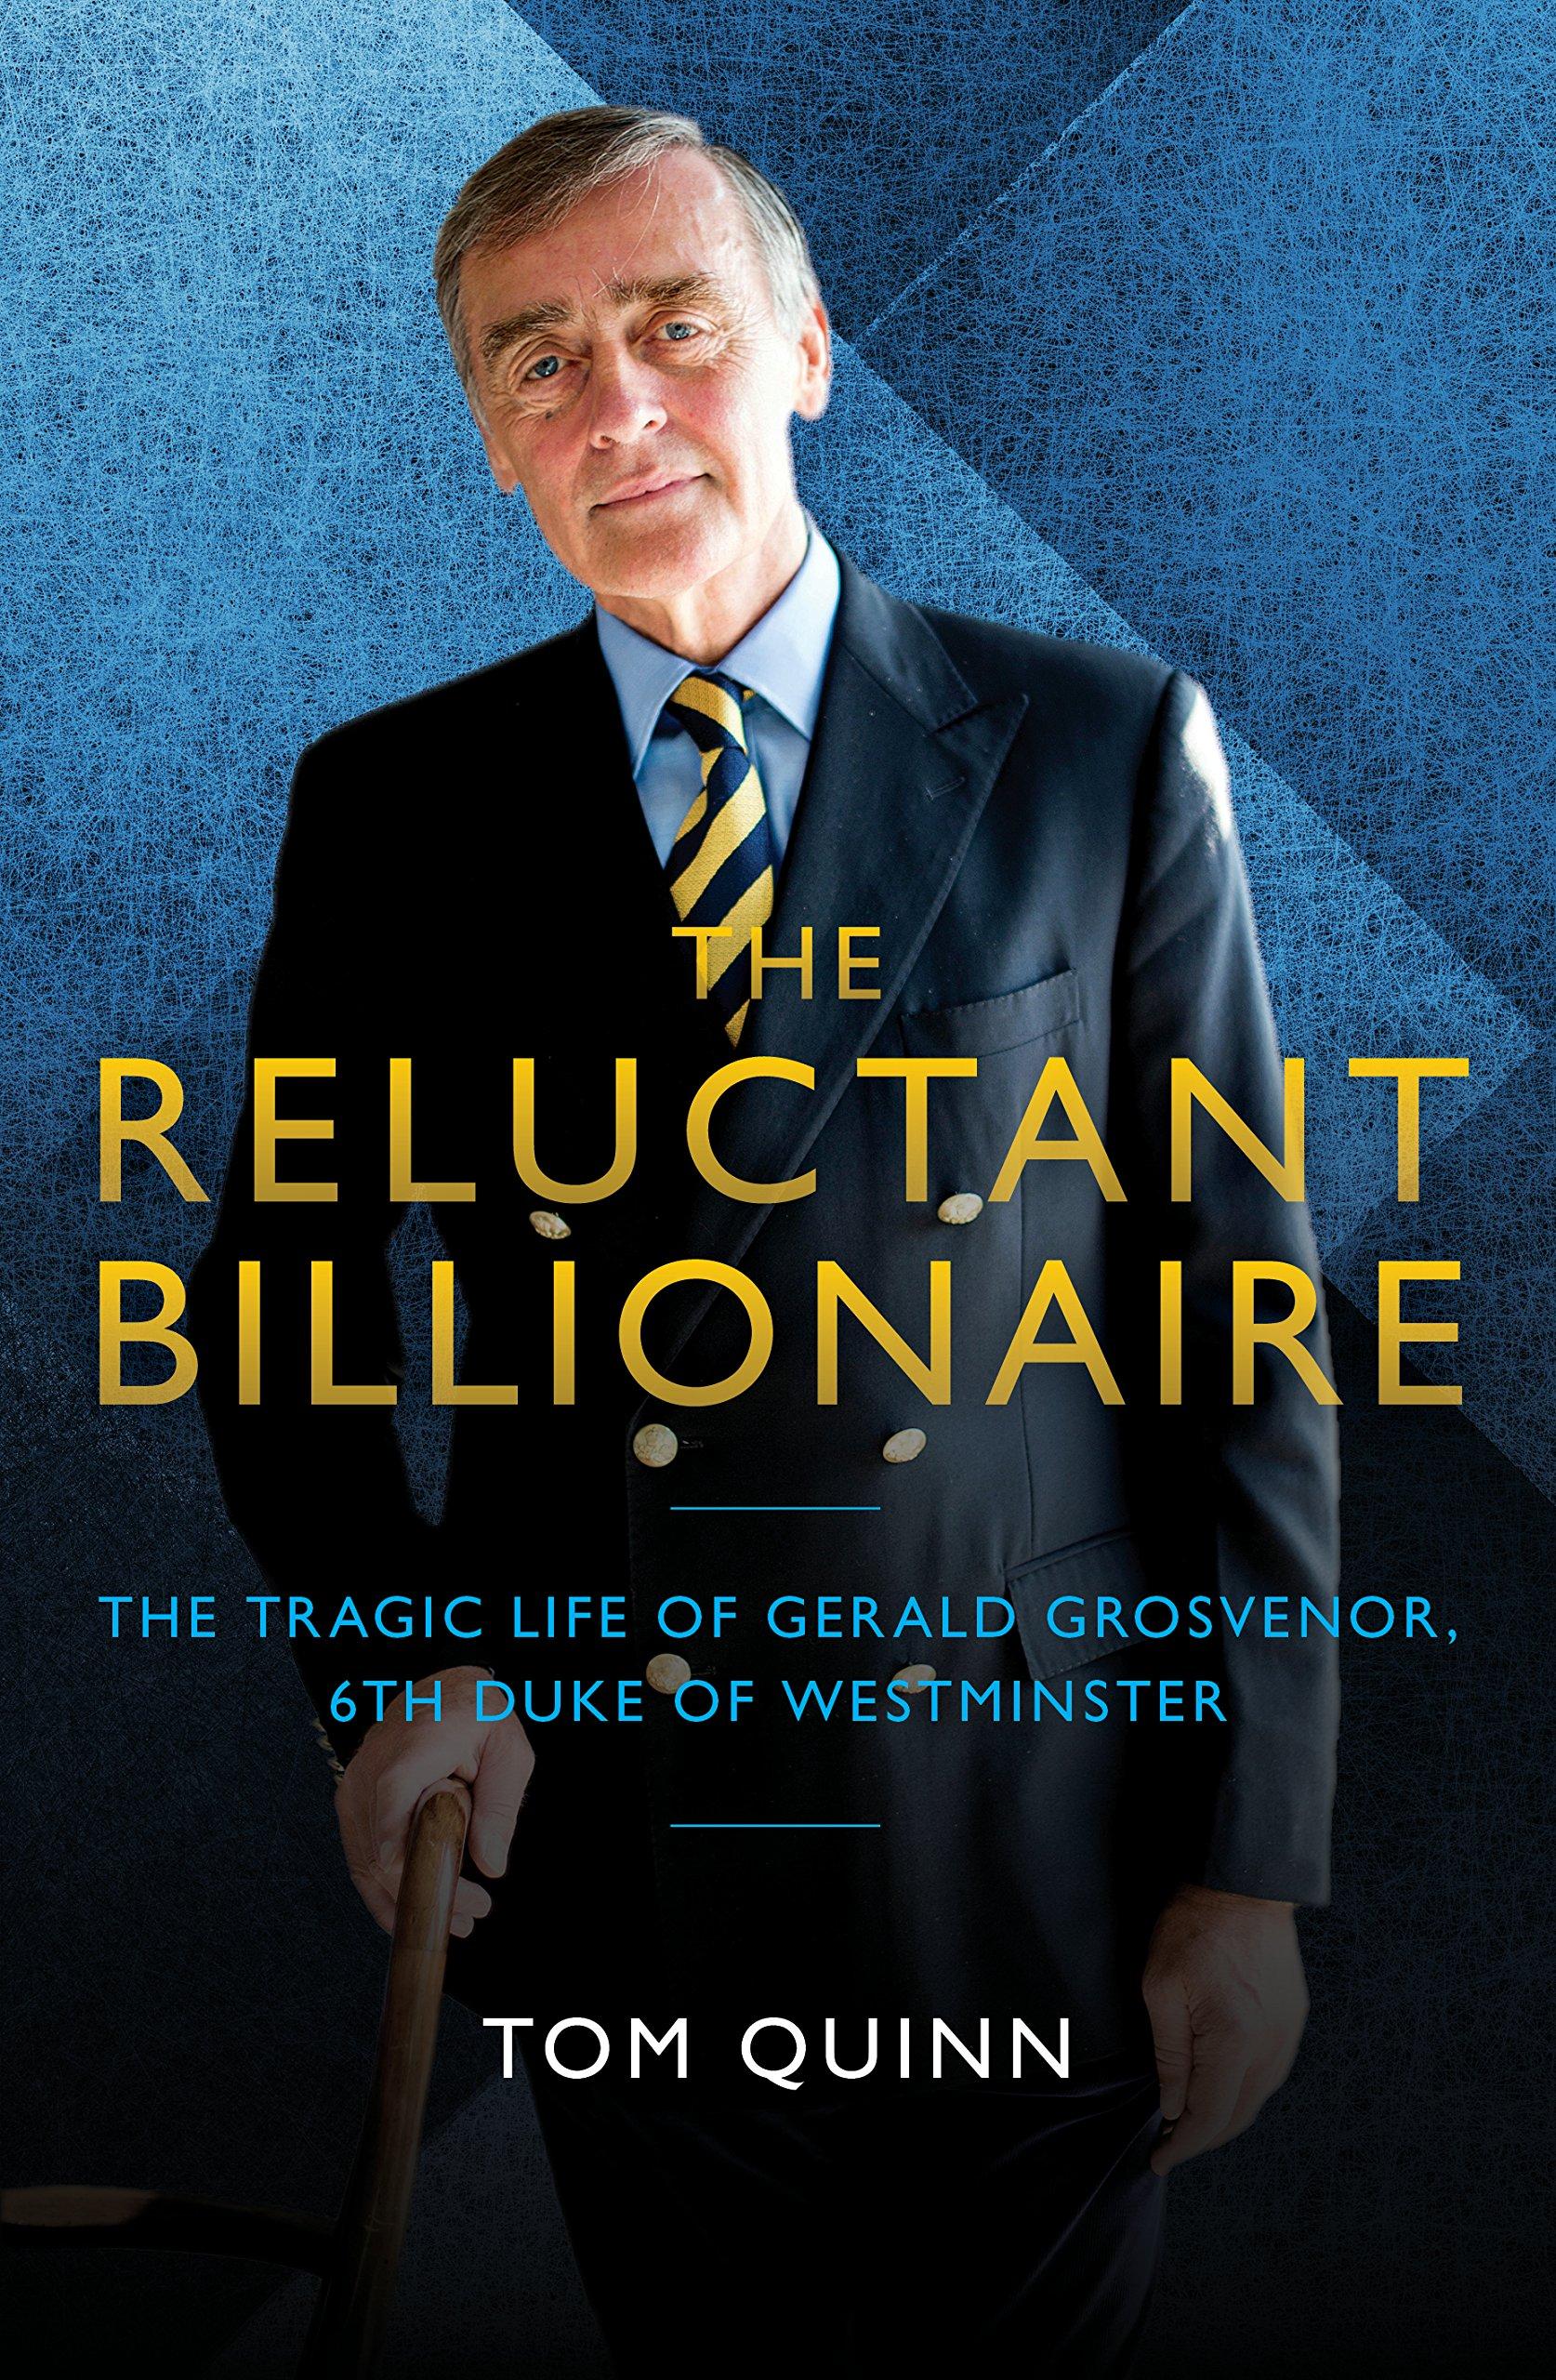 The Reluctant Billionaire: The Tragic Life of Gerald Grosvenor, Sixth Duke  of Westminster: Amazon.co.uk: Tom Quinn: 9781785903168: Books